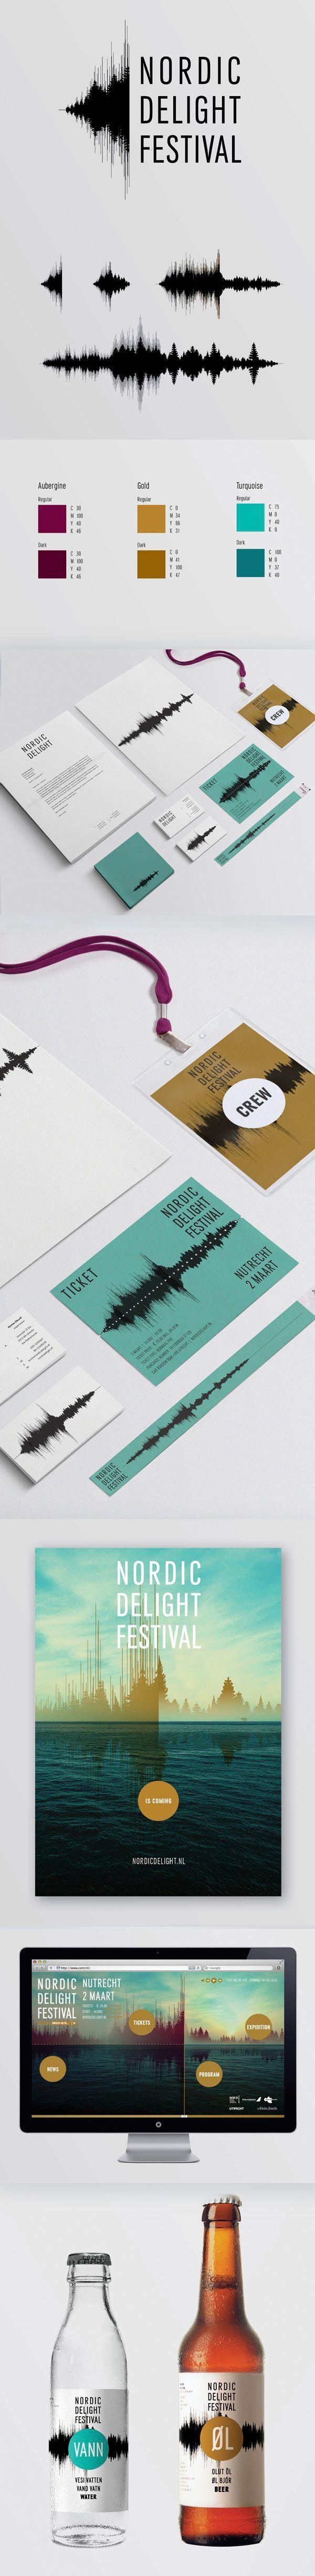 Using a sound graph on music festival media, genius! #brandingdesign